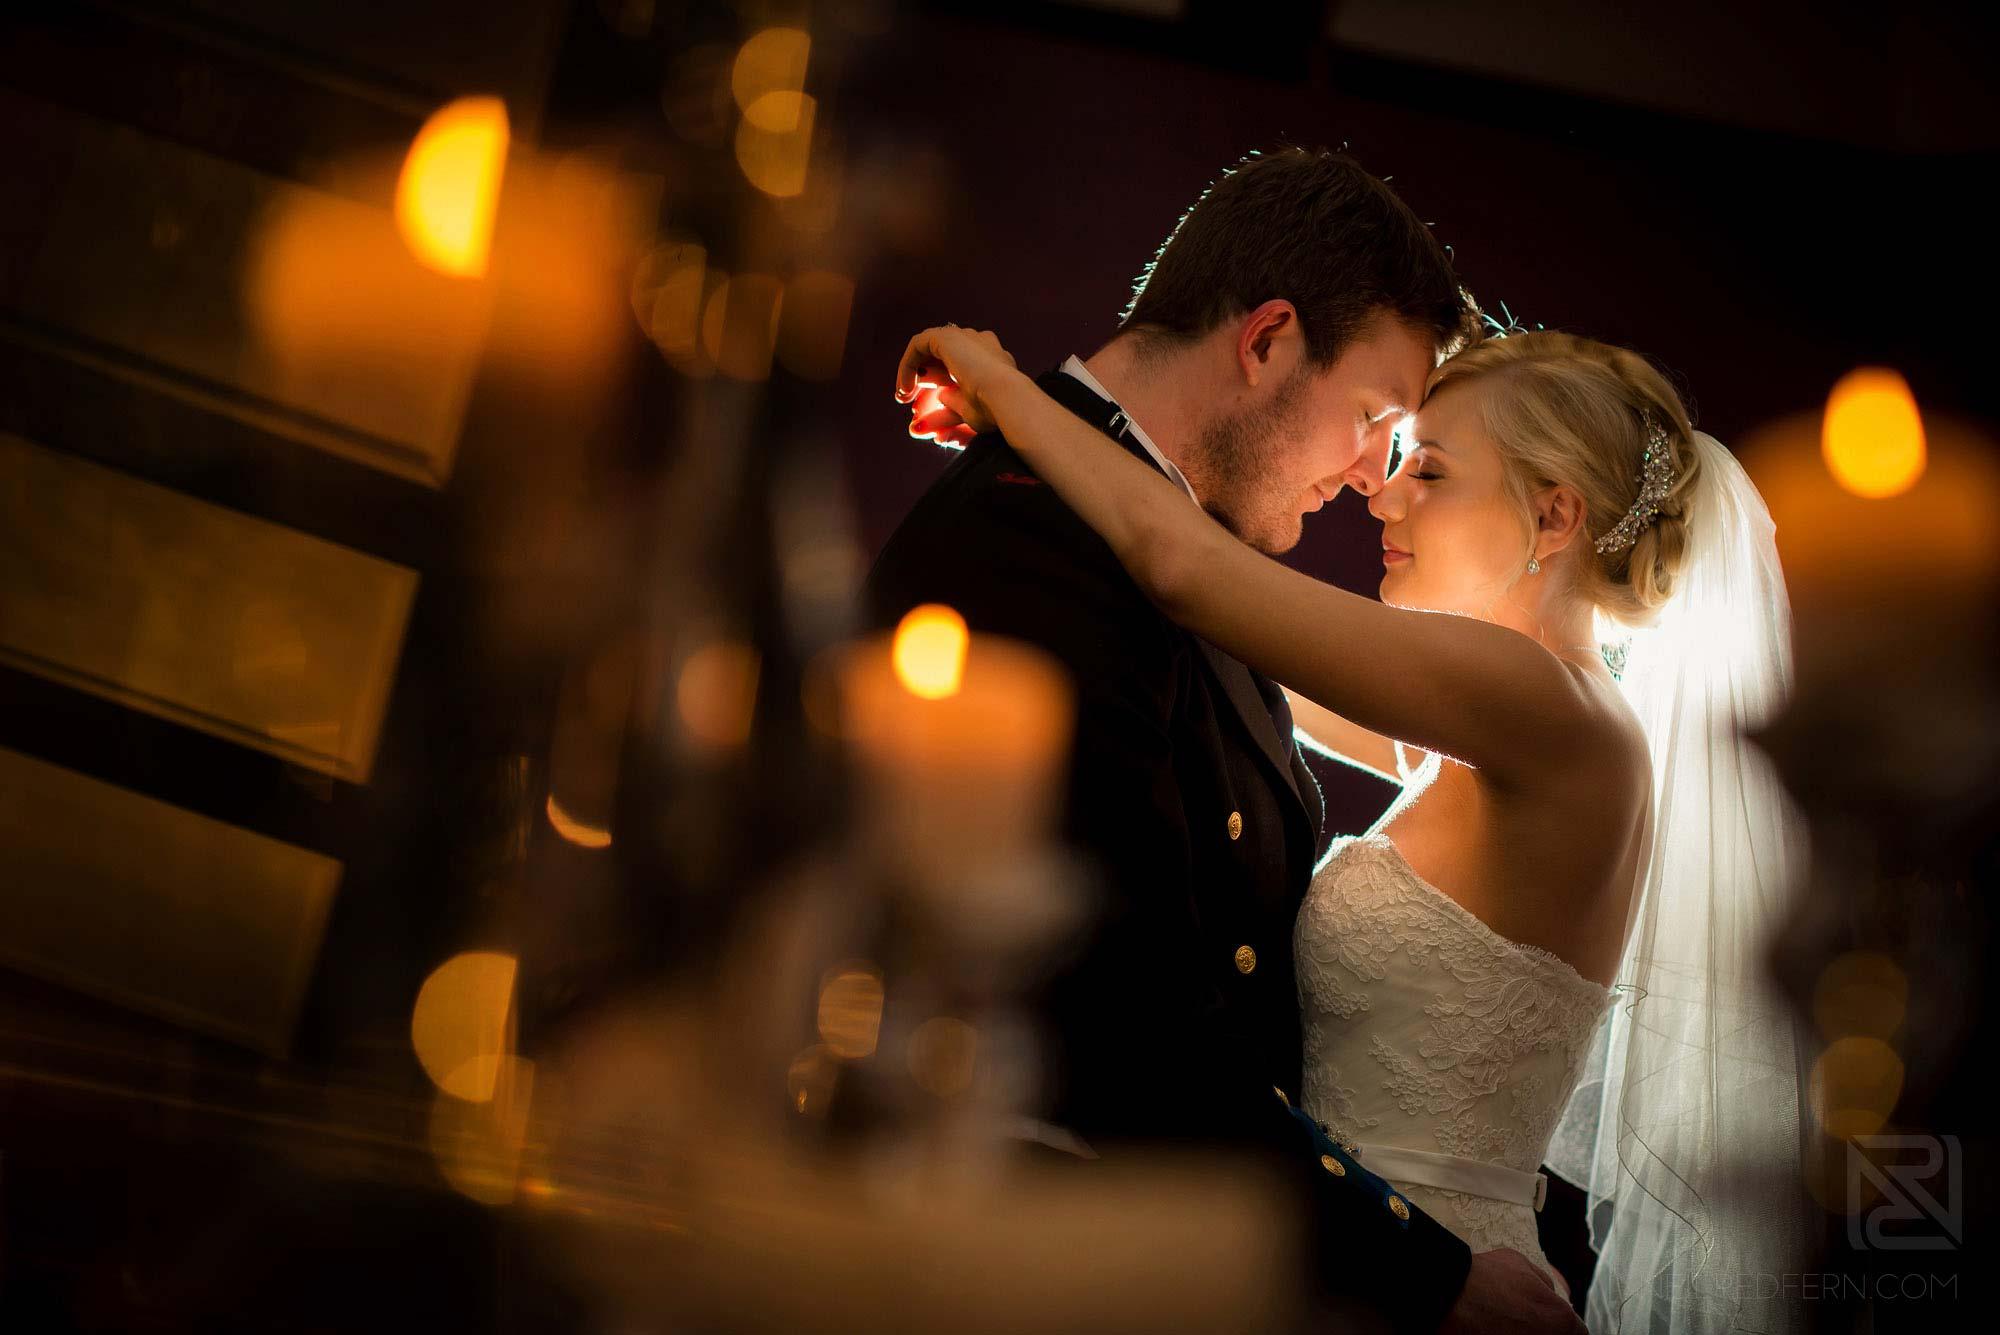 romantic photograph of newlyweds at winter wedding